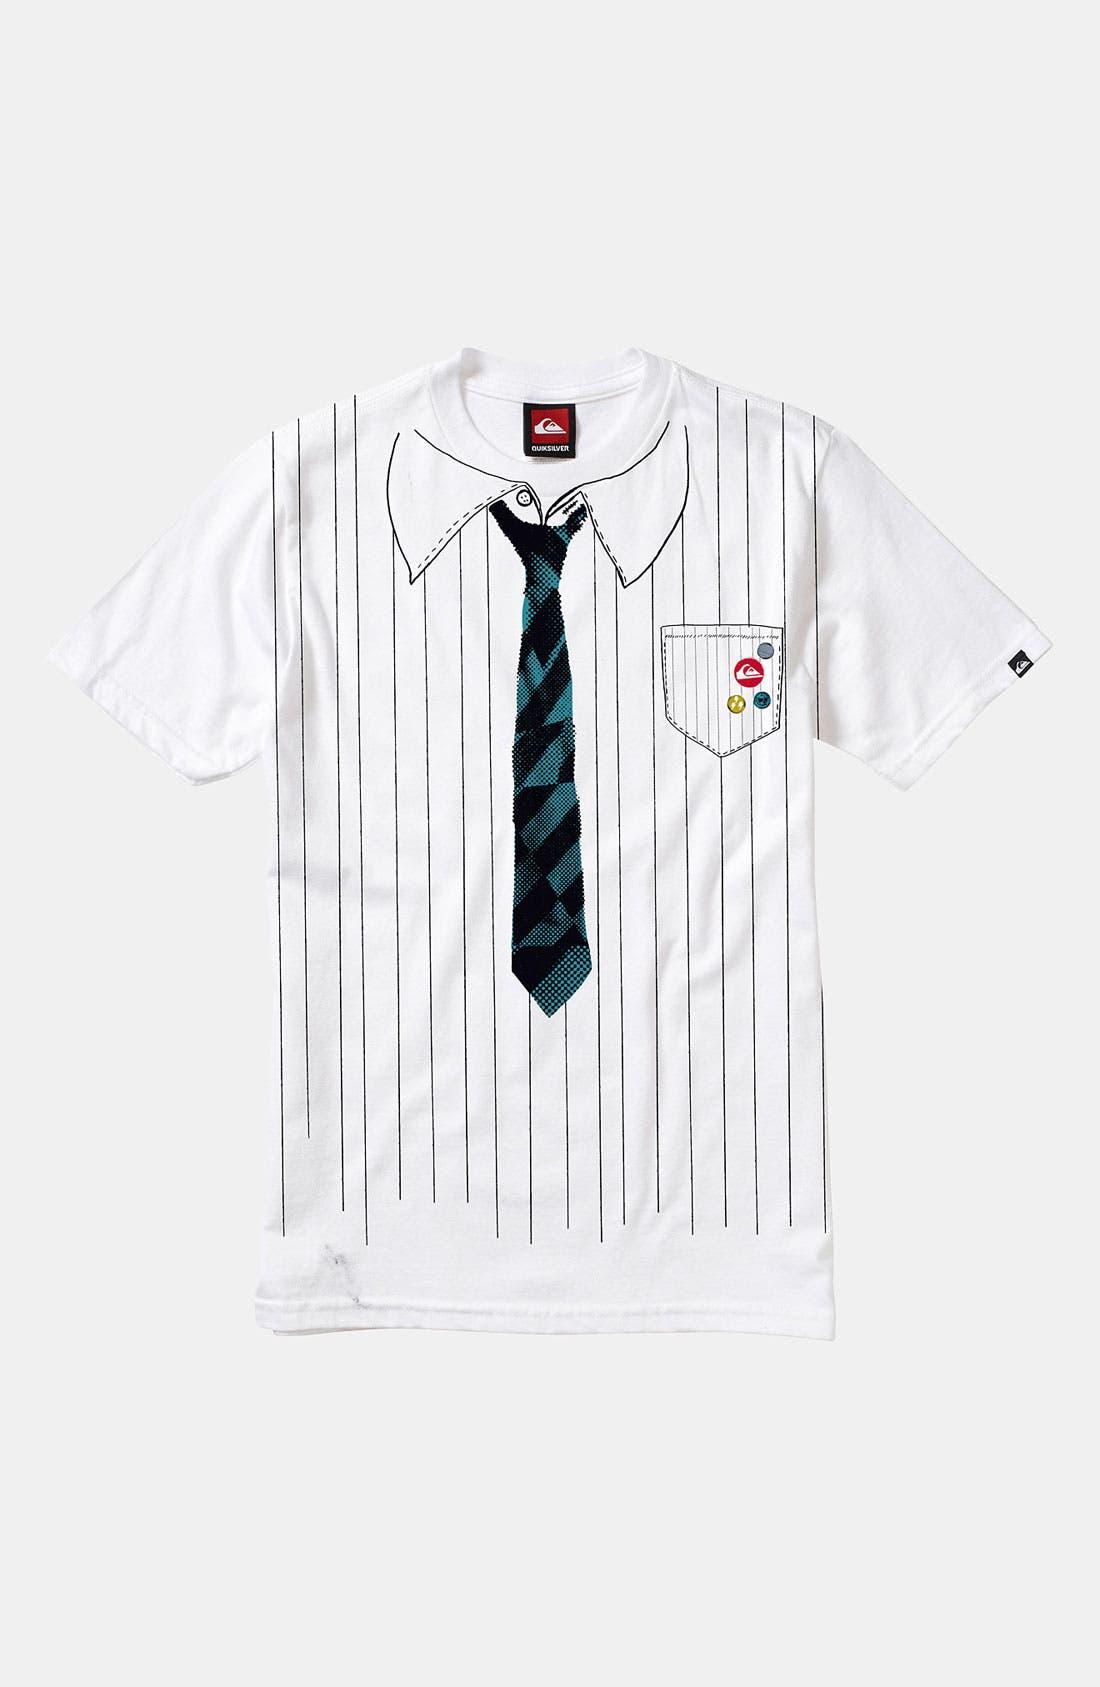 Alternate Image 1 Selected - Quiksilver 'Loosen Up' T-Shirt (Big Boys)